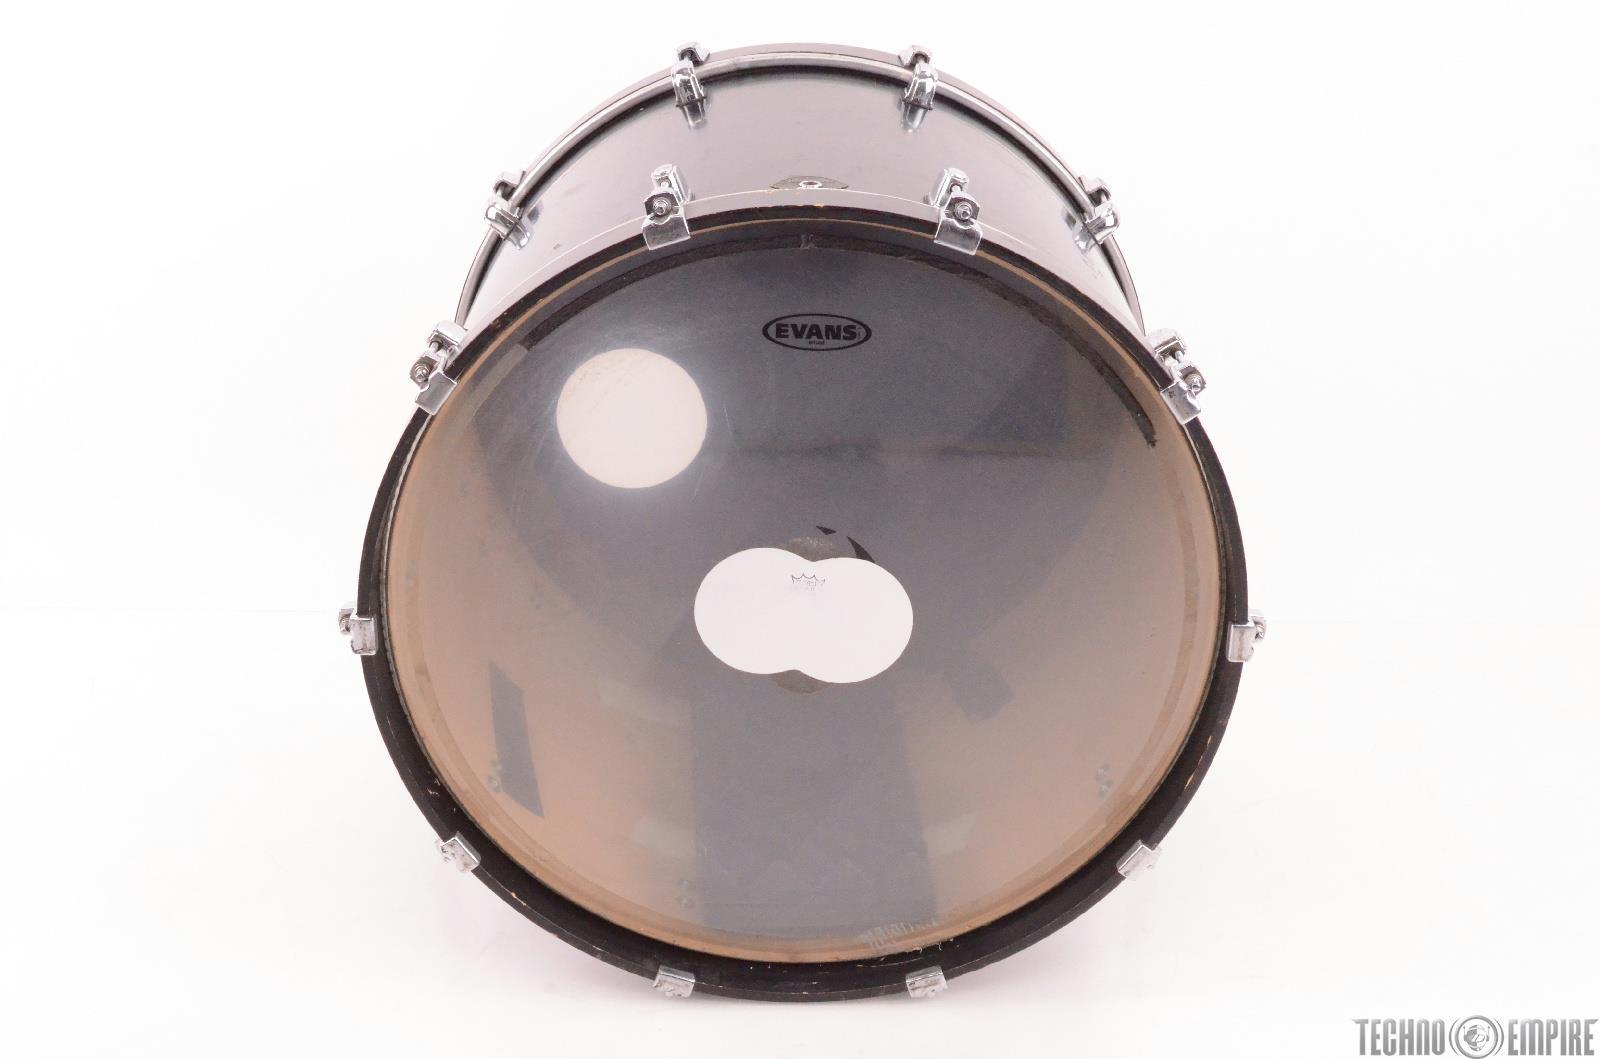 2 tama starclassic 24x18 birch kick drums owned by roy mayorga japan mij 27474 ebay. Black Bedroom Furniture Sets. Home Design Ideas